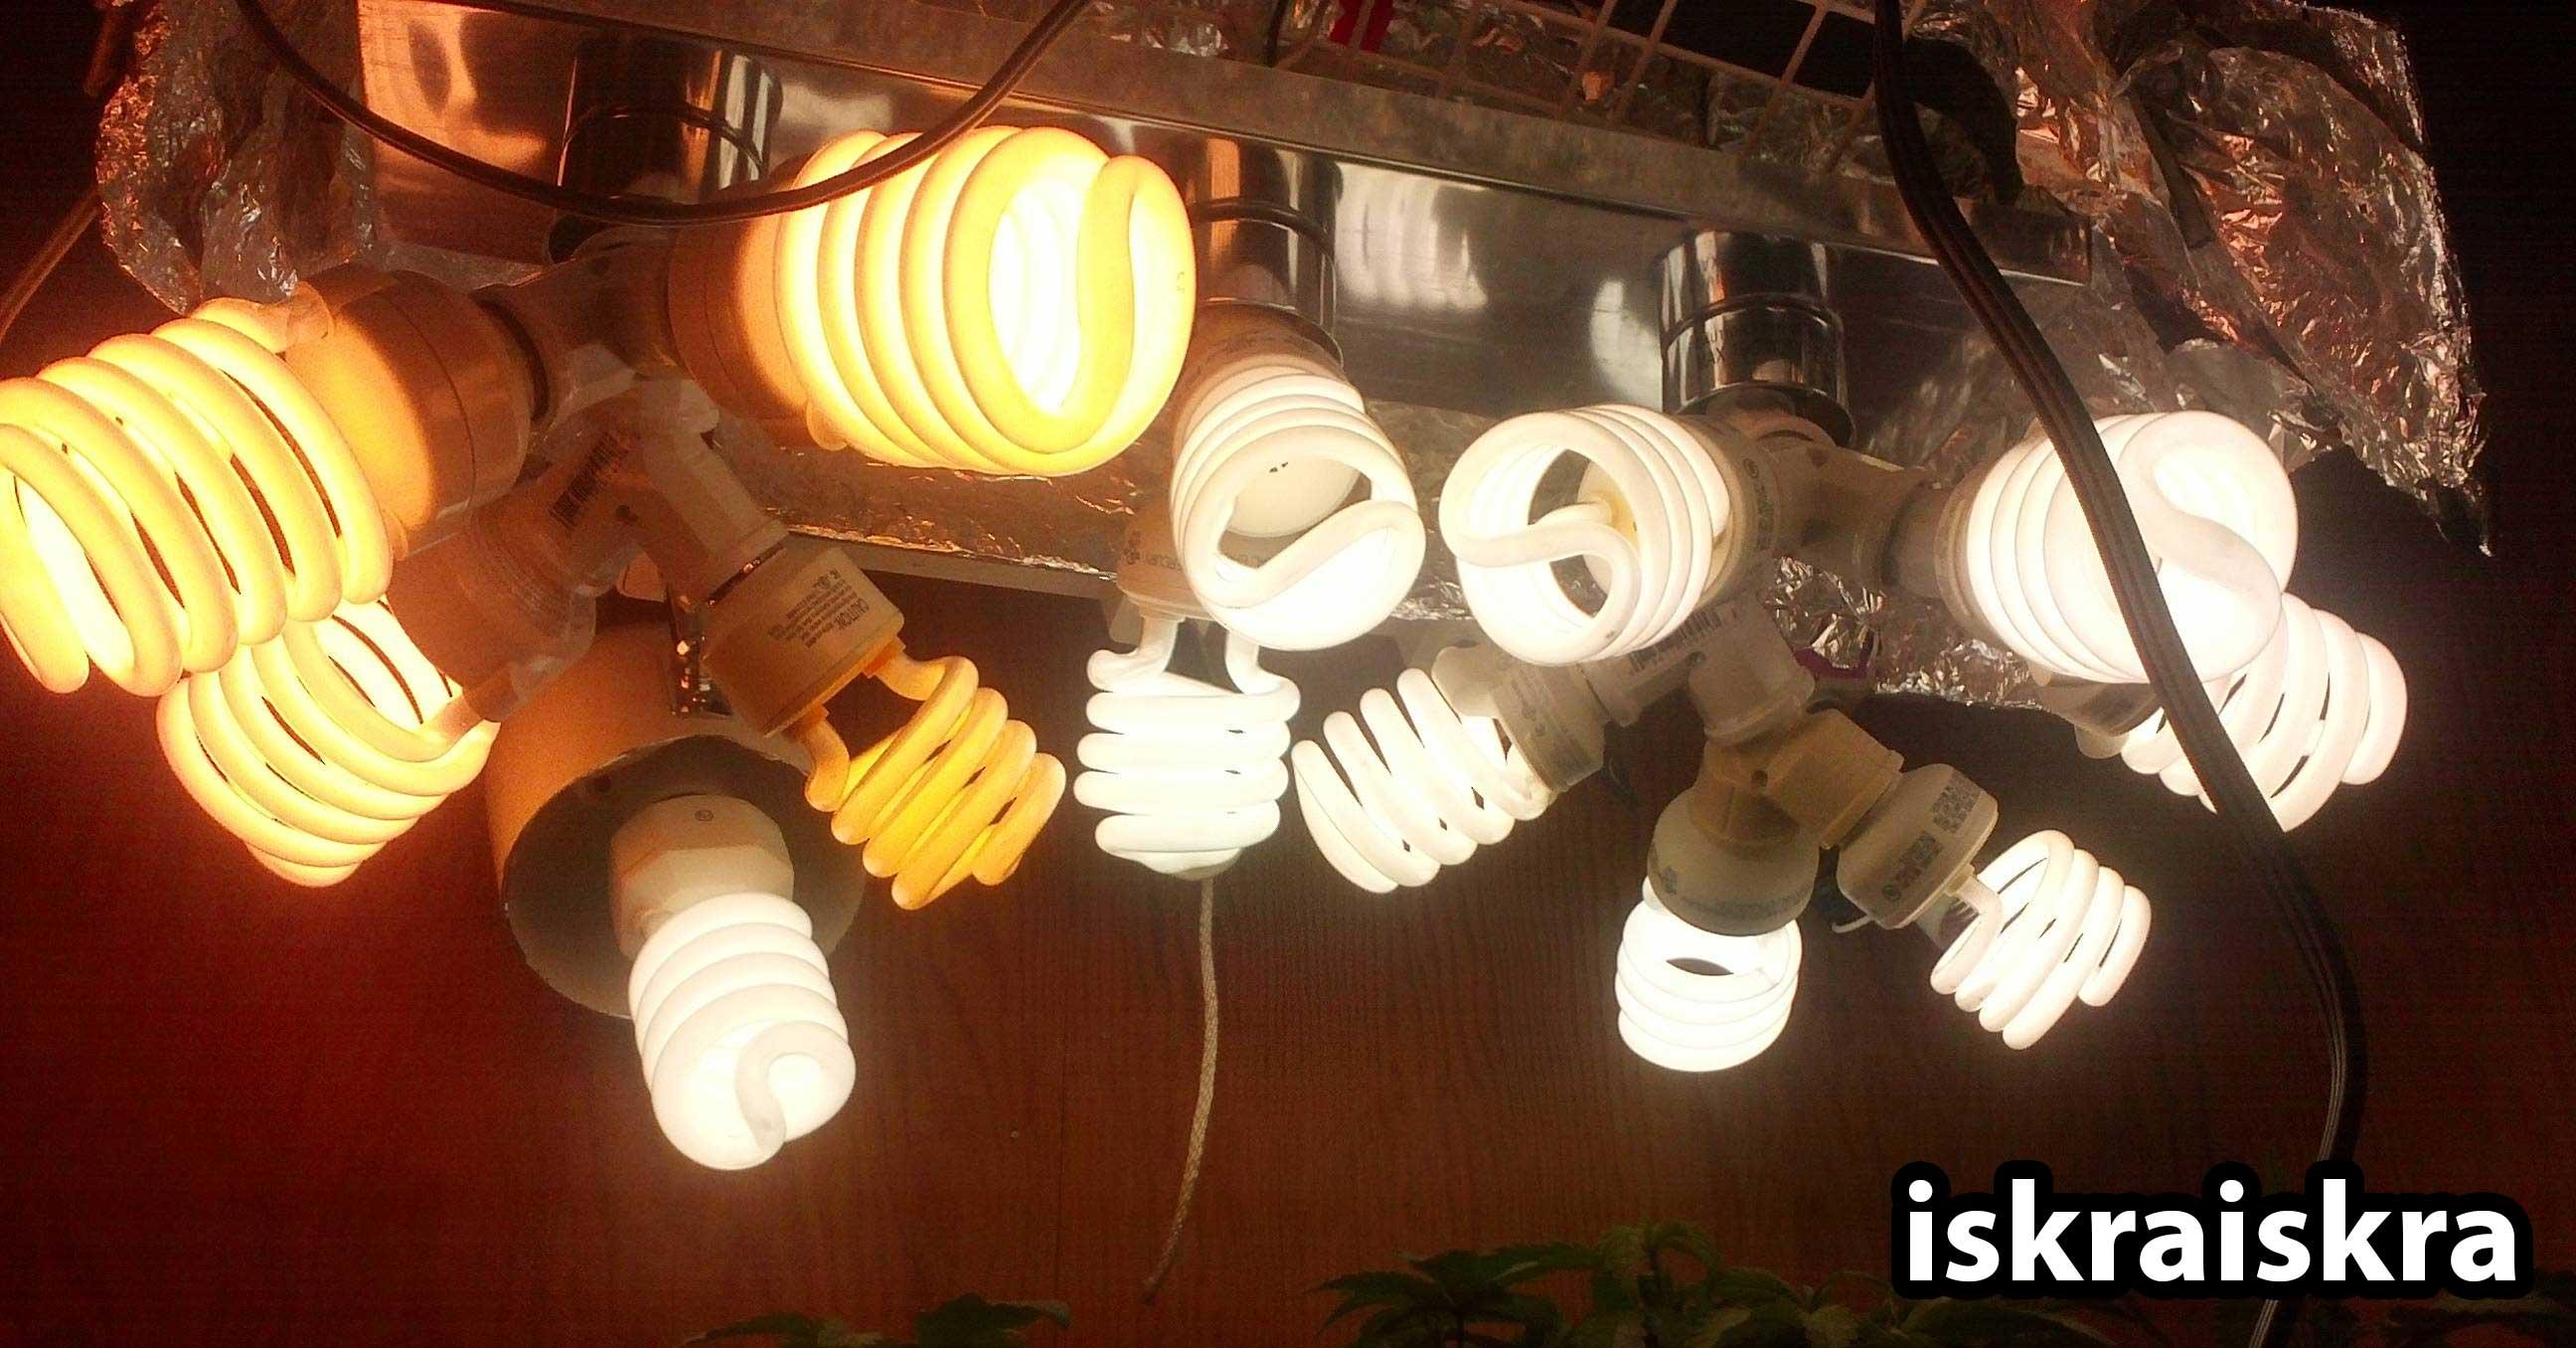 Cfl Light Bulbs Growing Plants